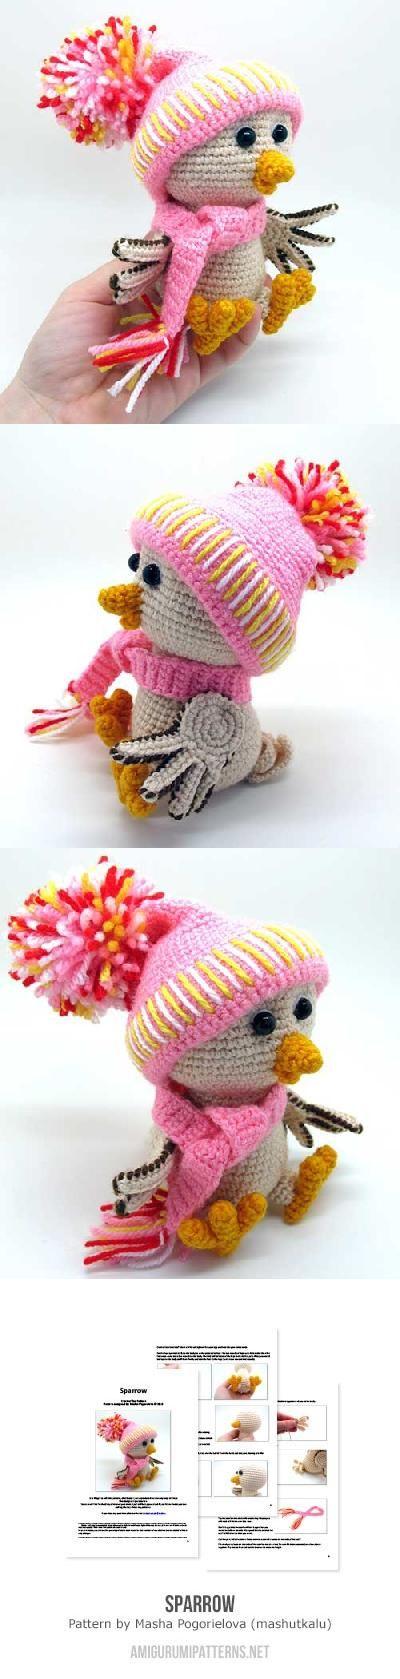 Amigurumi Tutorial Masha : Sparrow amigurumi pattern by Masha Pogorielova (mashutkalu ...